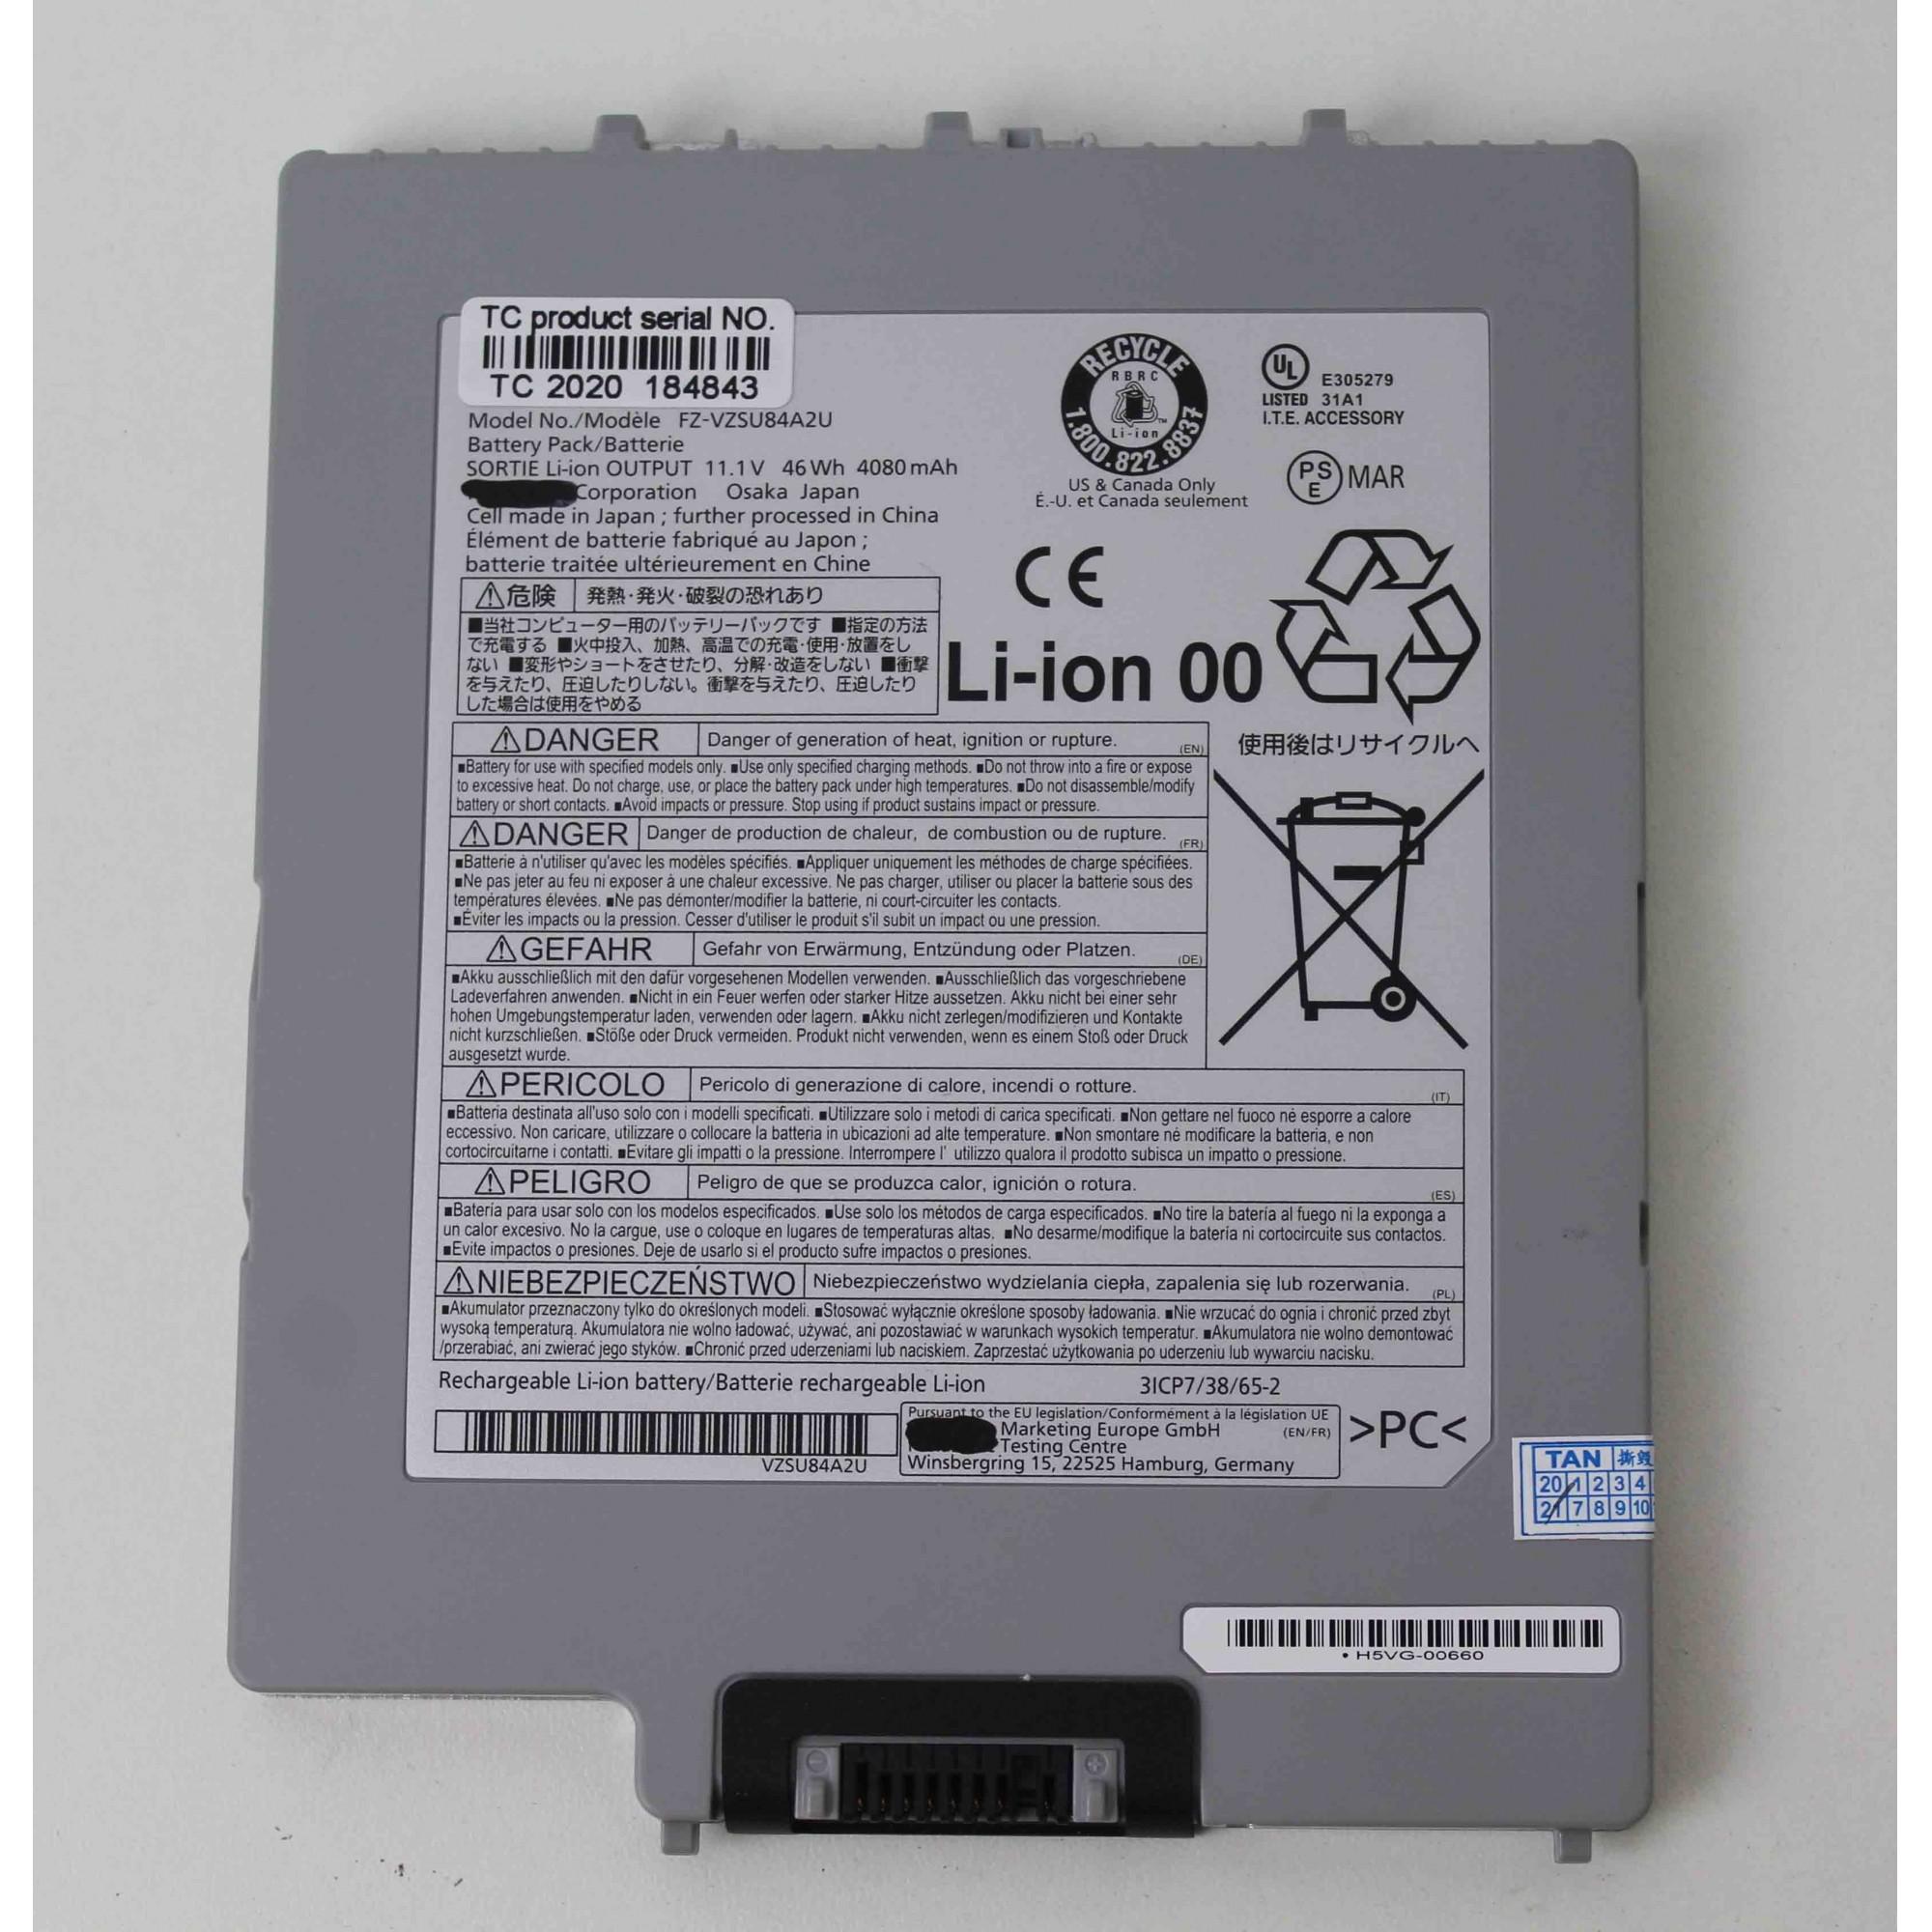 Bateria para Toughpad FZ-G1 FZ-VZSU84A2U 4080mAh 46Wh